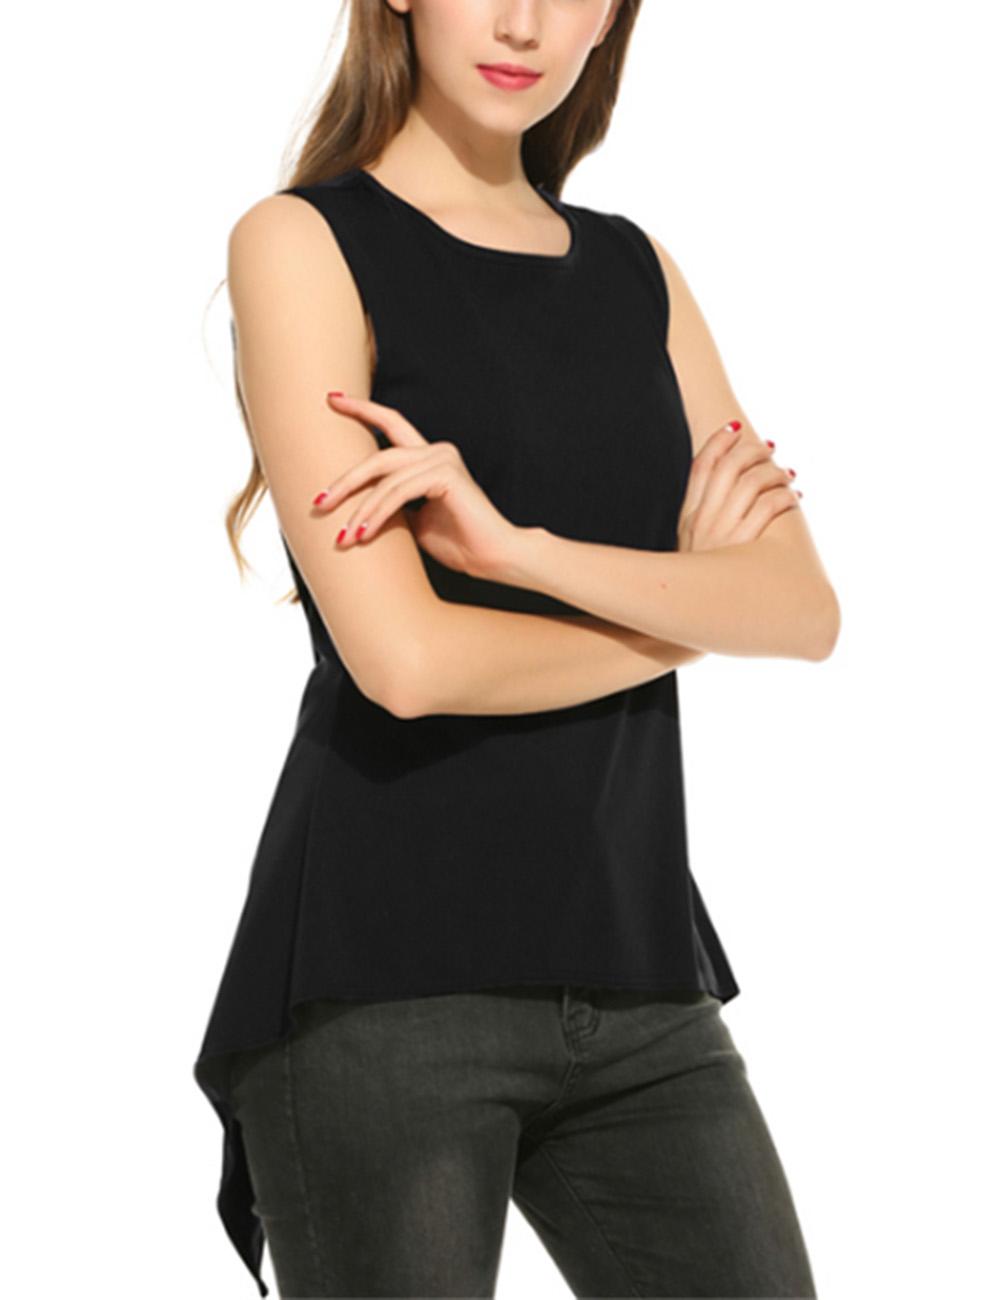 Women Solid Color Back Split Irregularity Tops Slim Design Sleeveless Tops Shirt